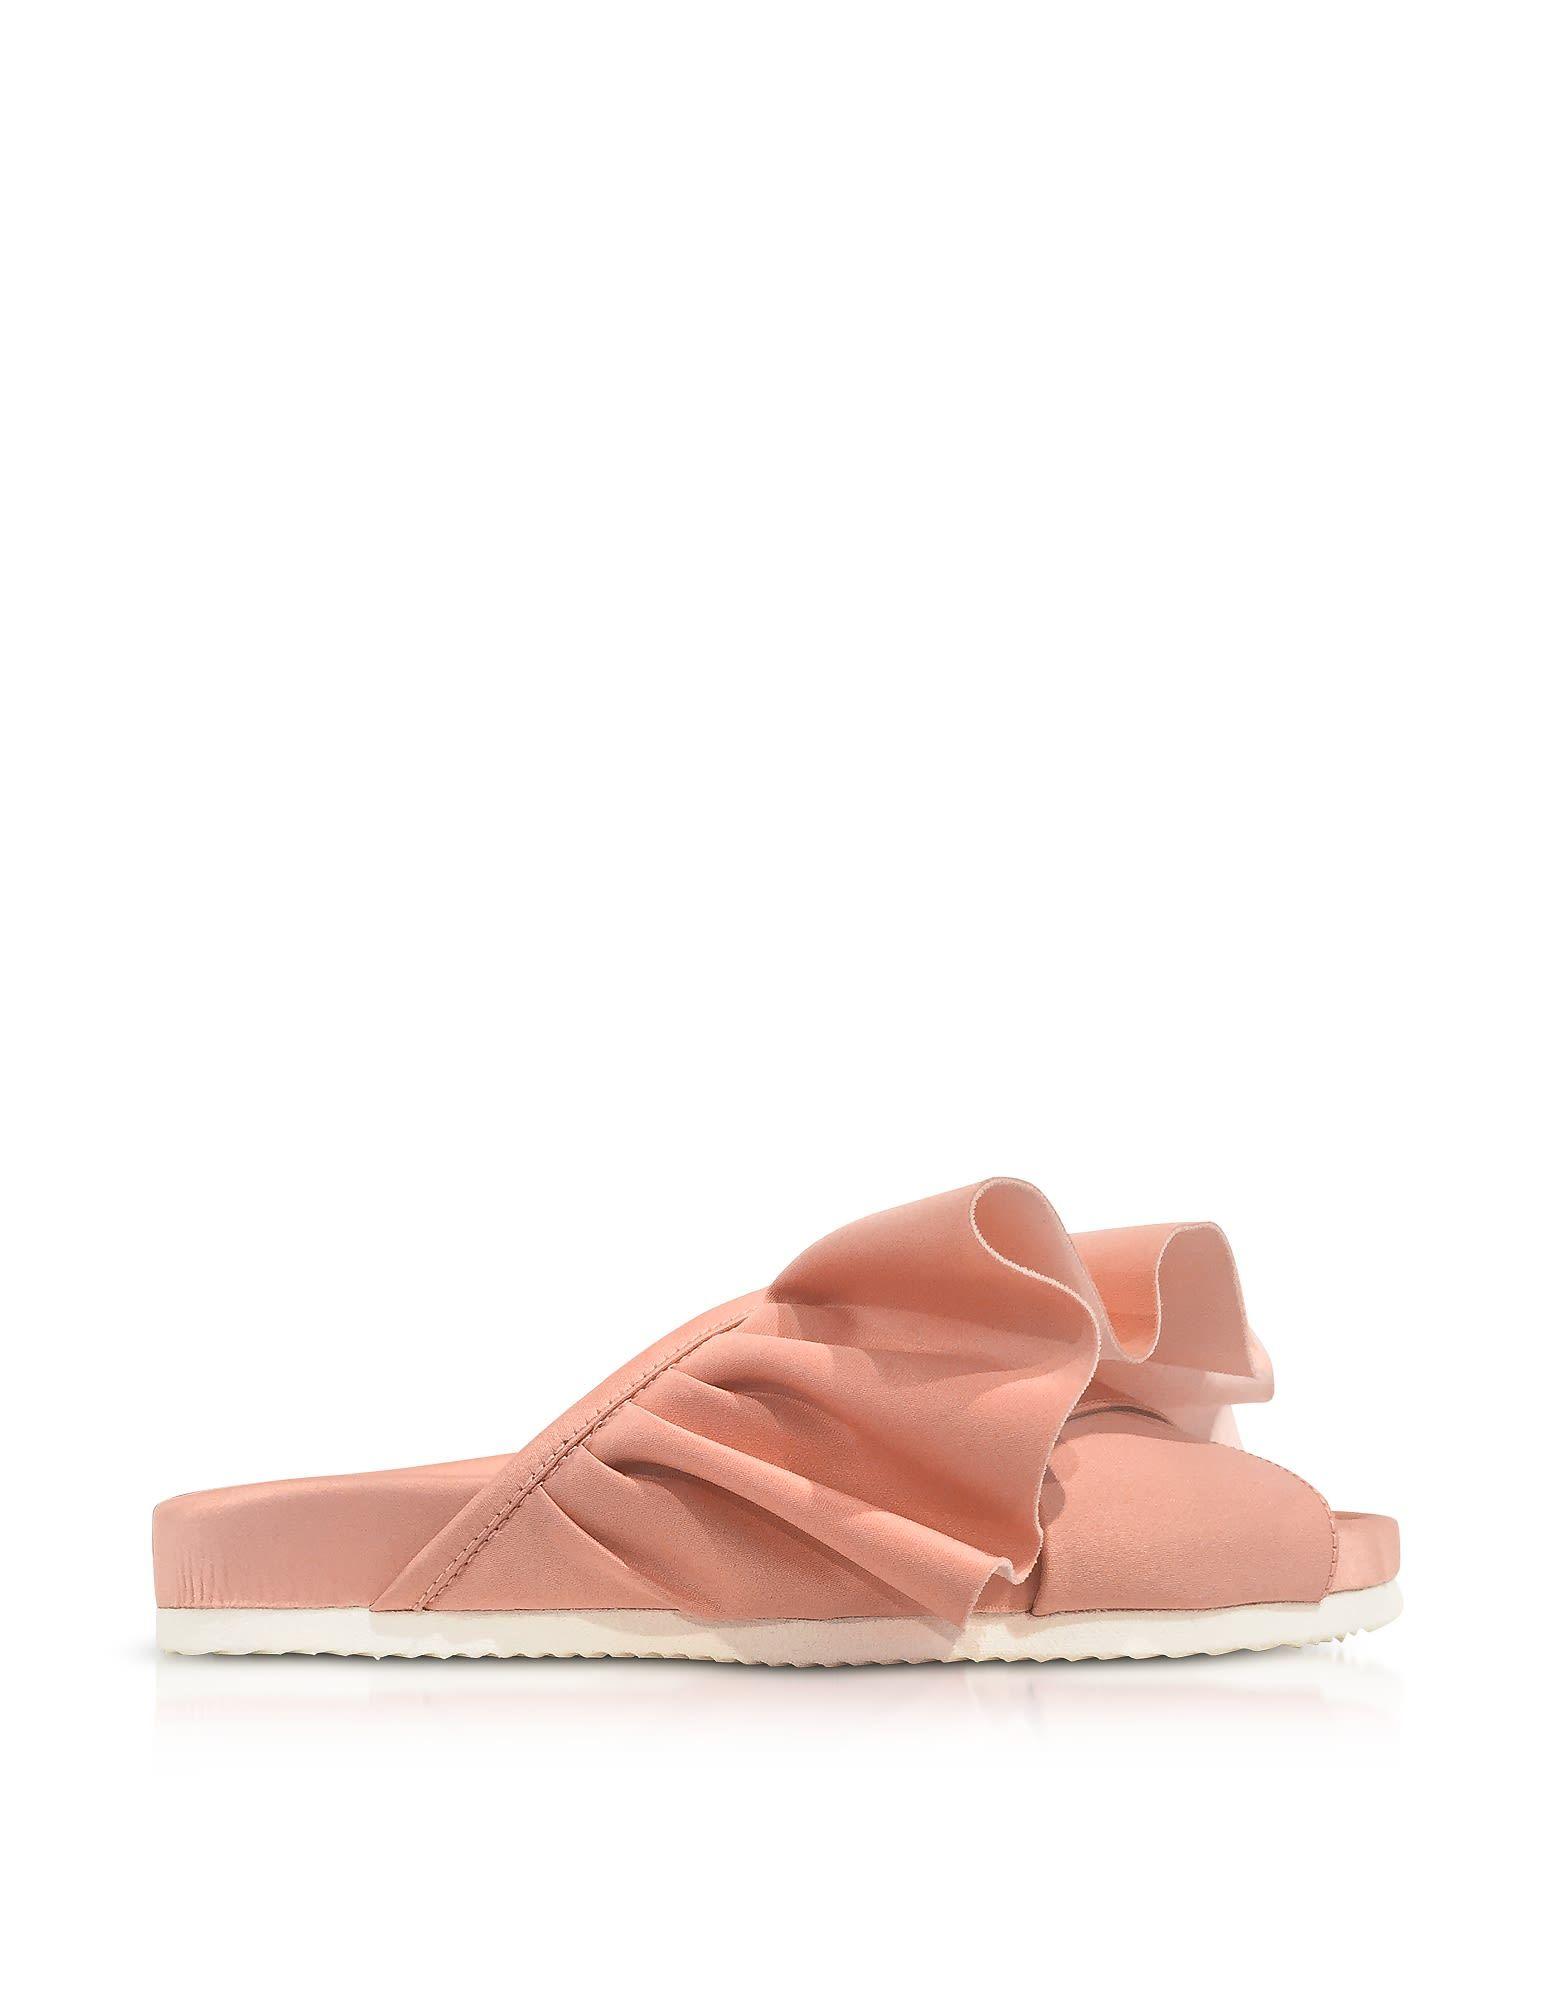 JOSHUA SANDERS Shoes, Satin Ruffle Slide Sandals